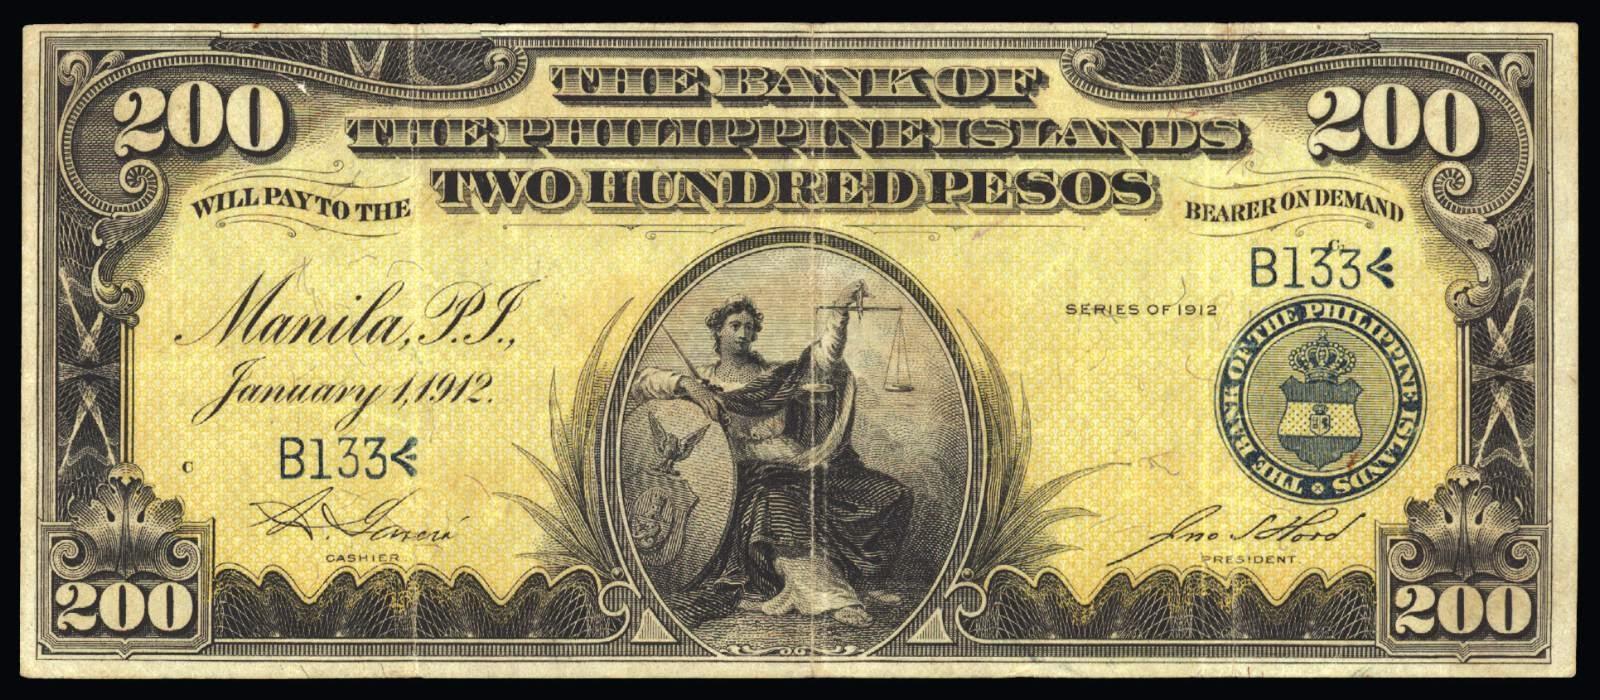 200 Pesos Philippine Bank Note 1912